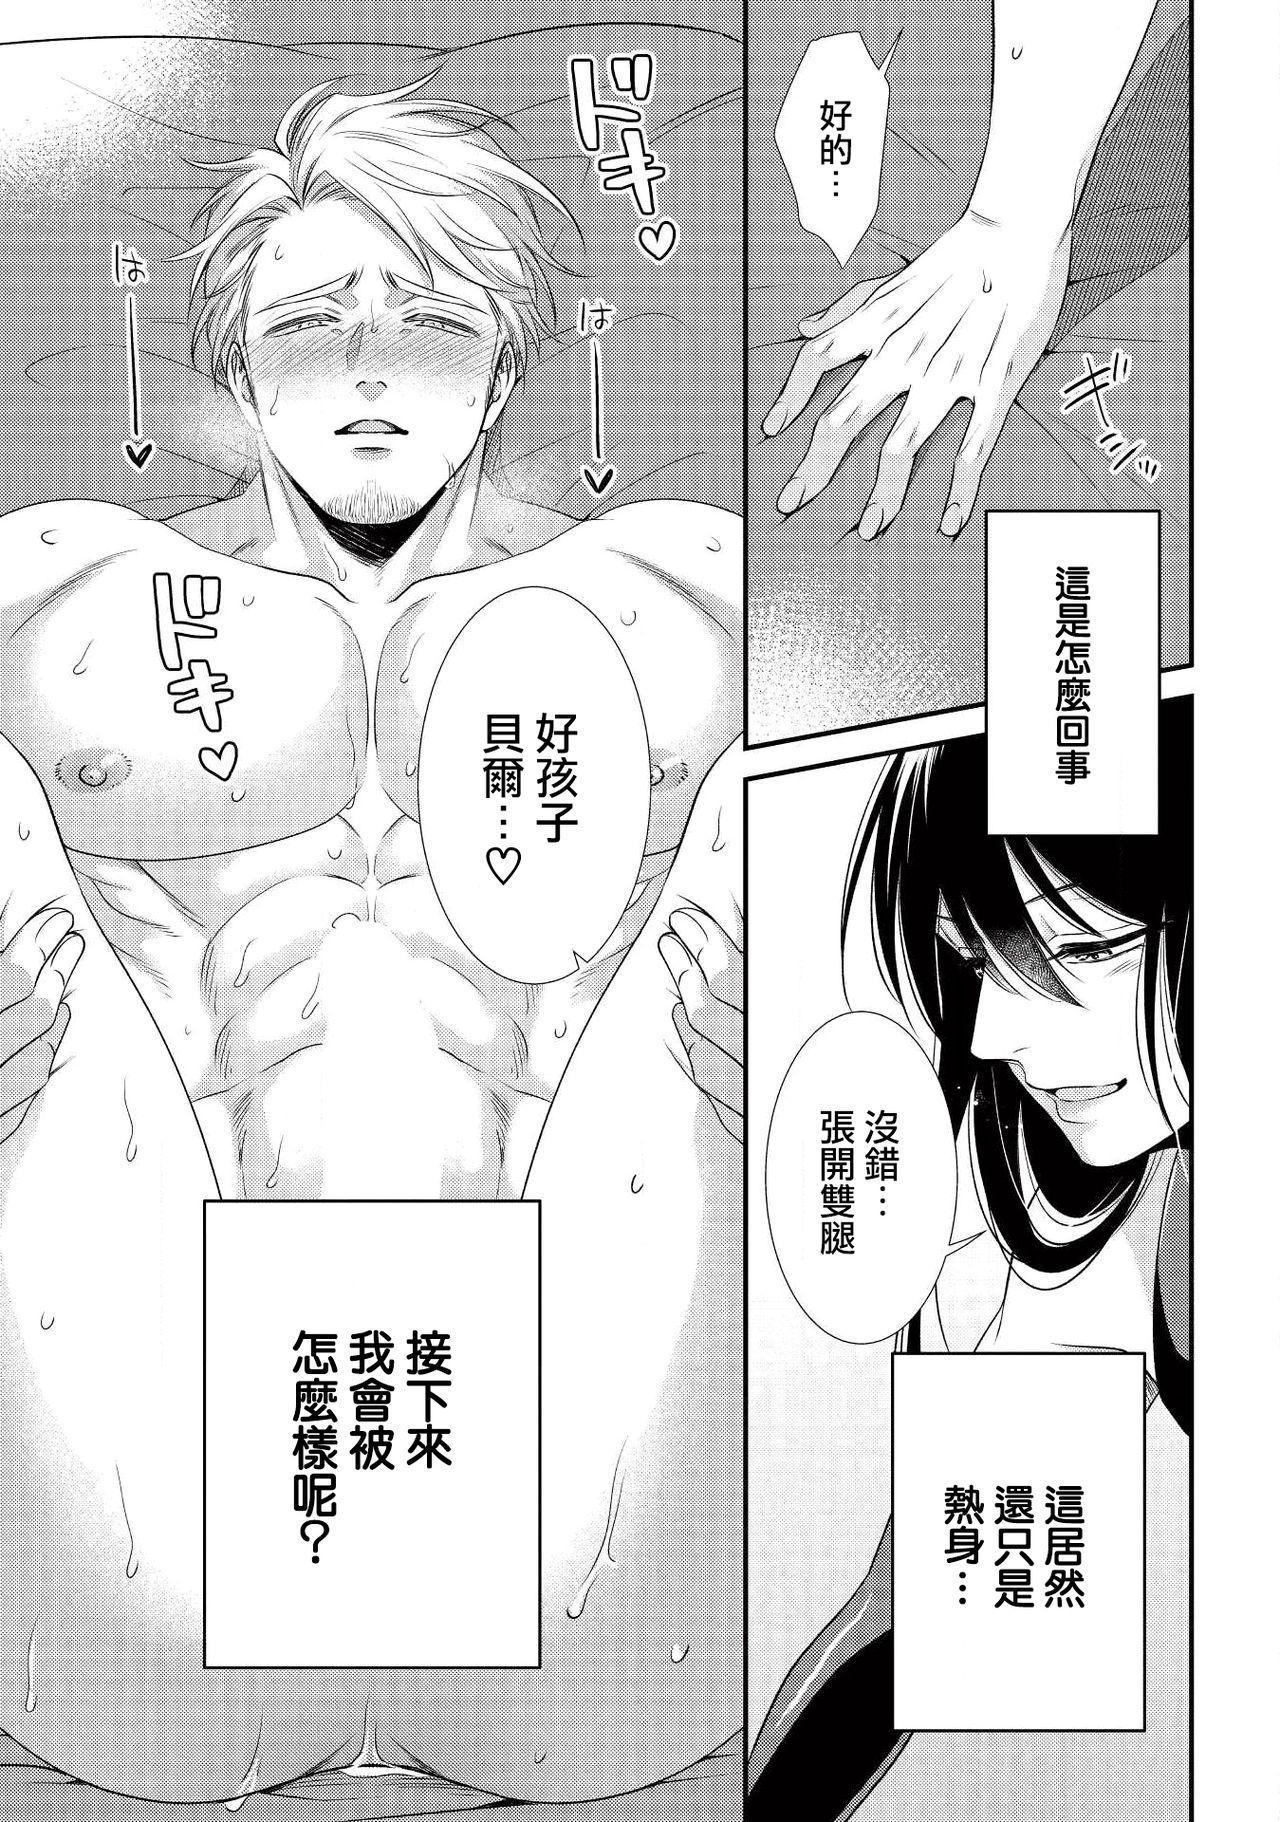 [Aion Kiu] Ijimete Kudasai Omega-sama ch.1-2 [Chinese] [沒有漢化] [Digital] 47